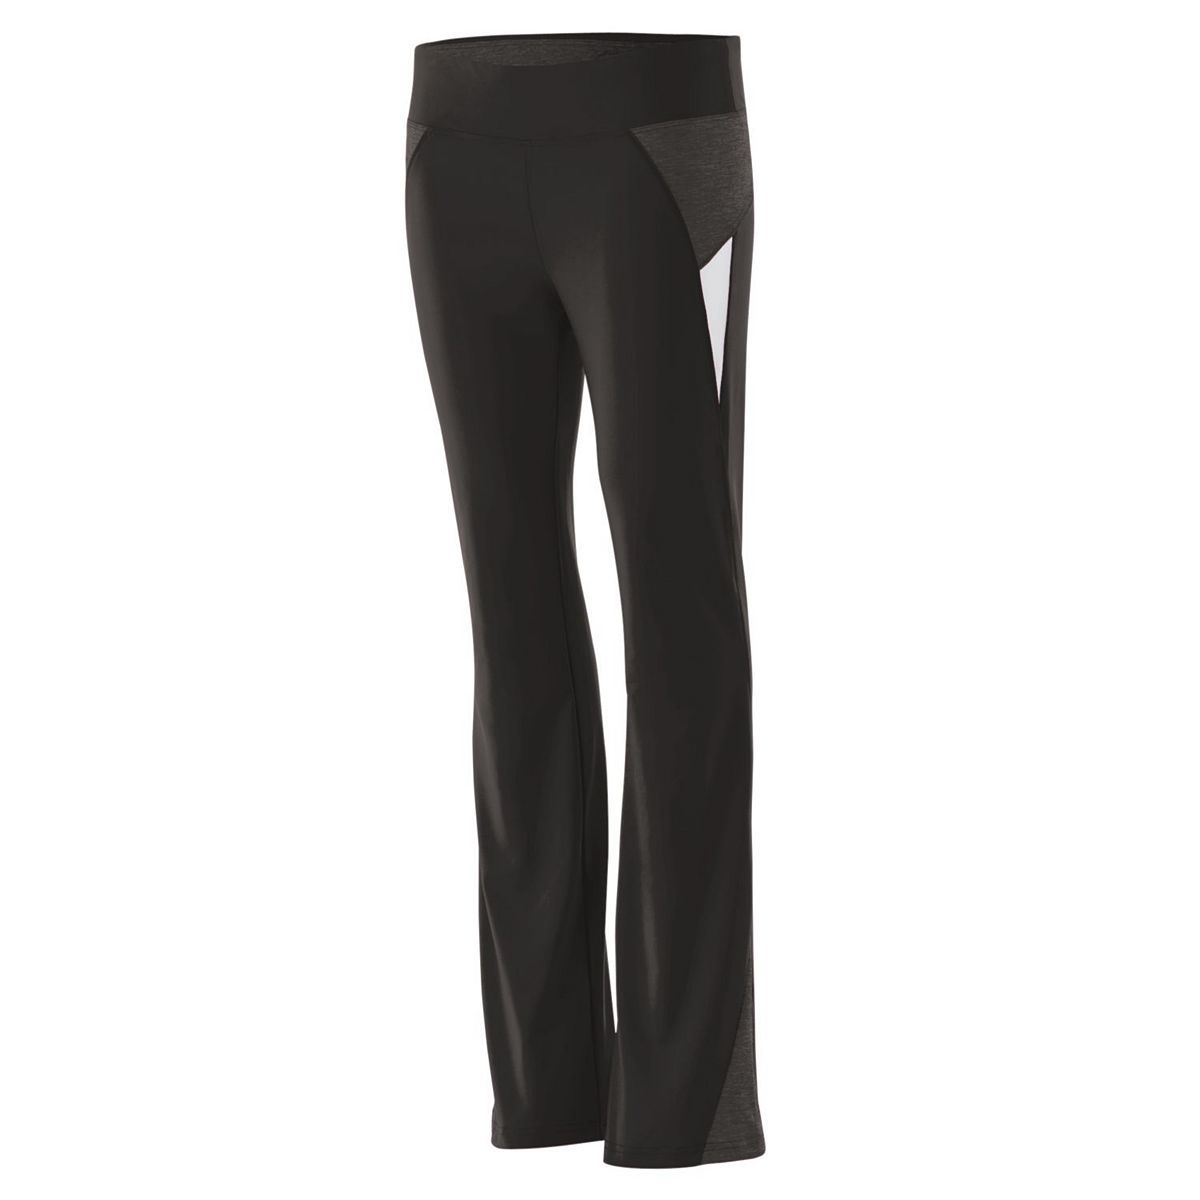 Ladies Tall Tumble Pant - BLACK/BLACK HEATHER/WHITE